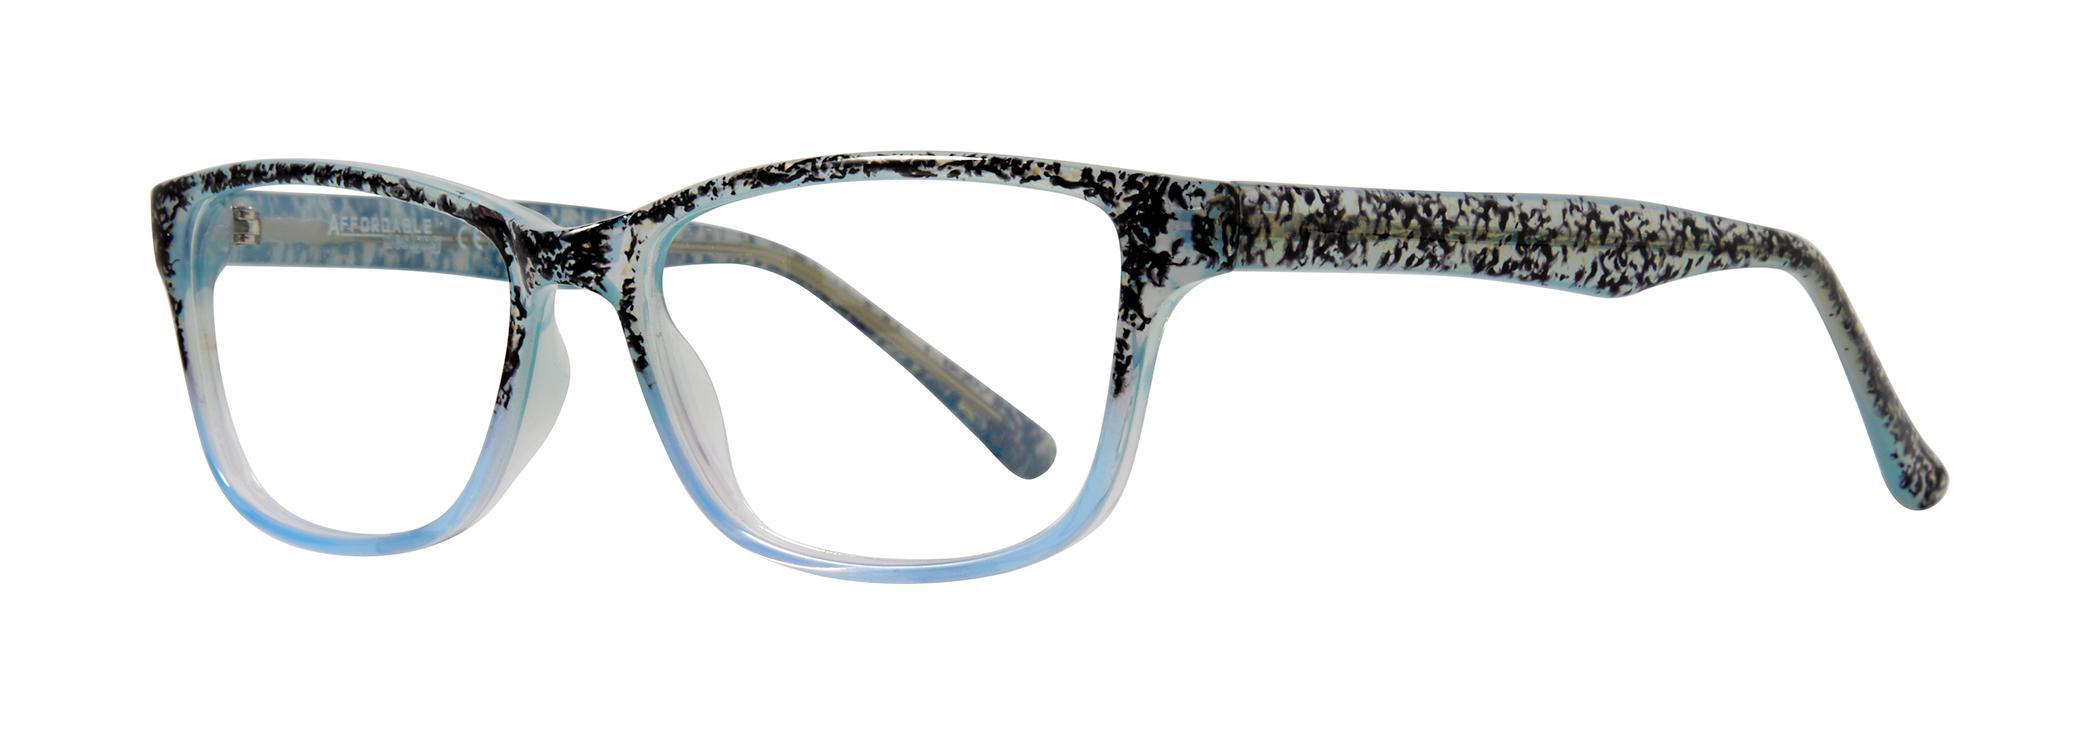 Affordable Designs Eyeglasses   Affordable Designs Eyeglasses Daisy